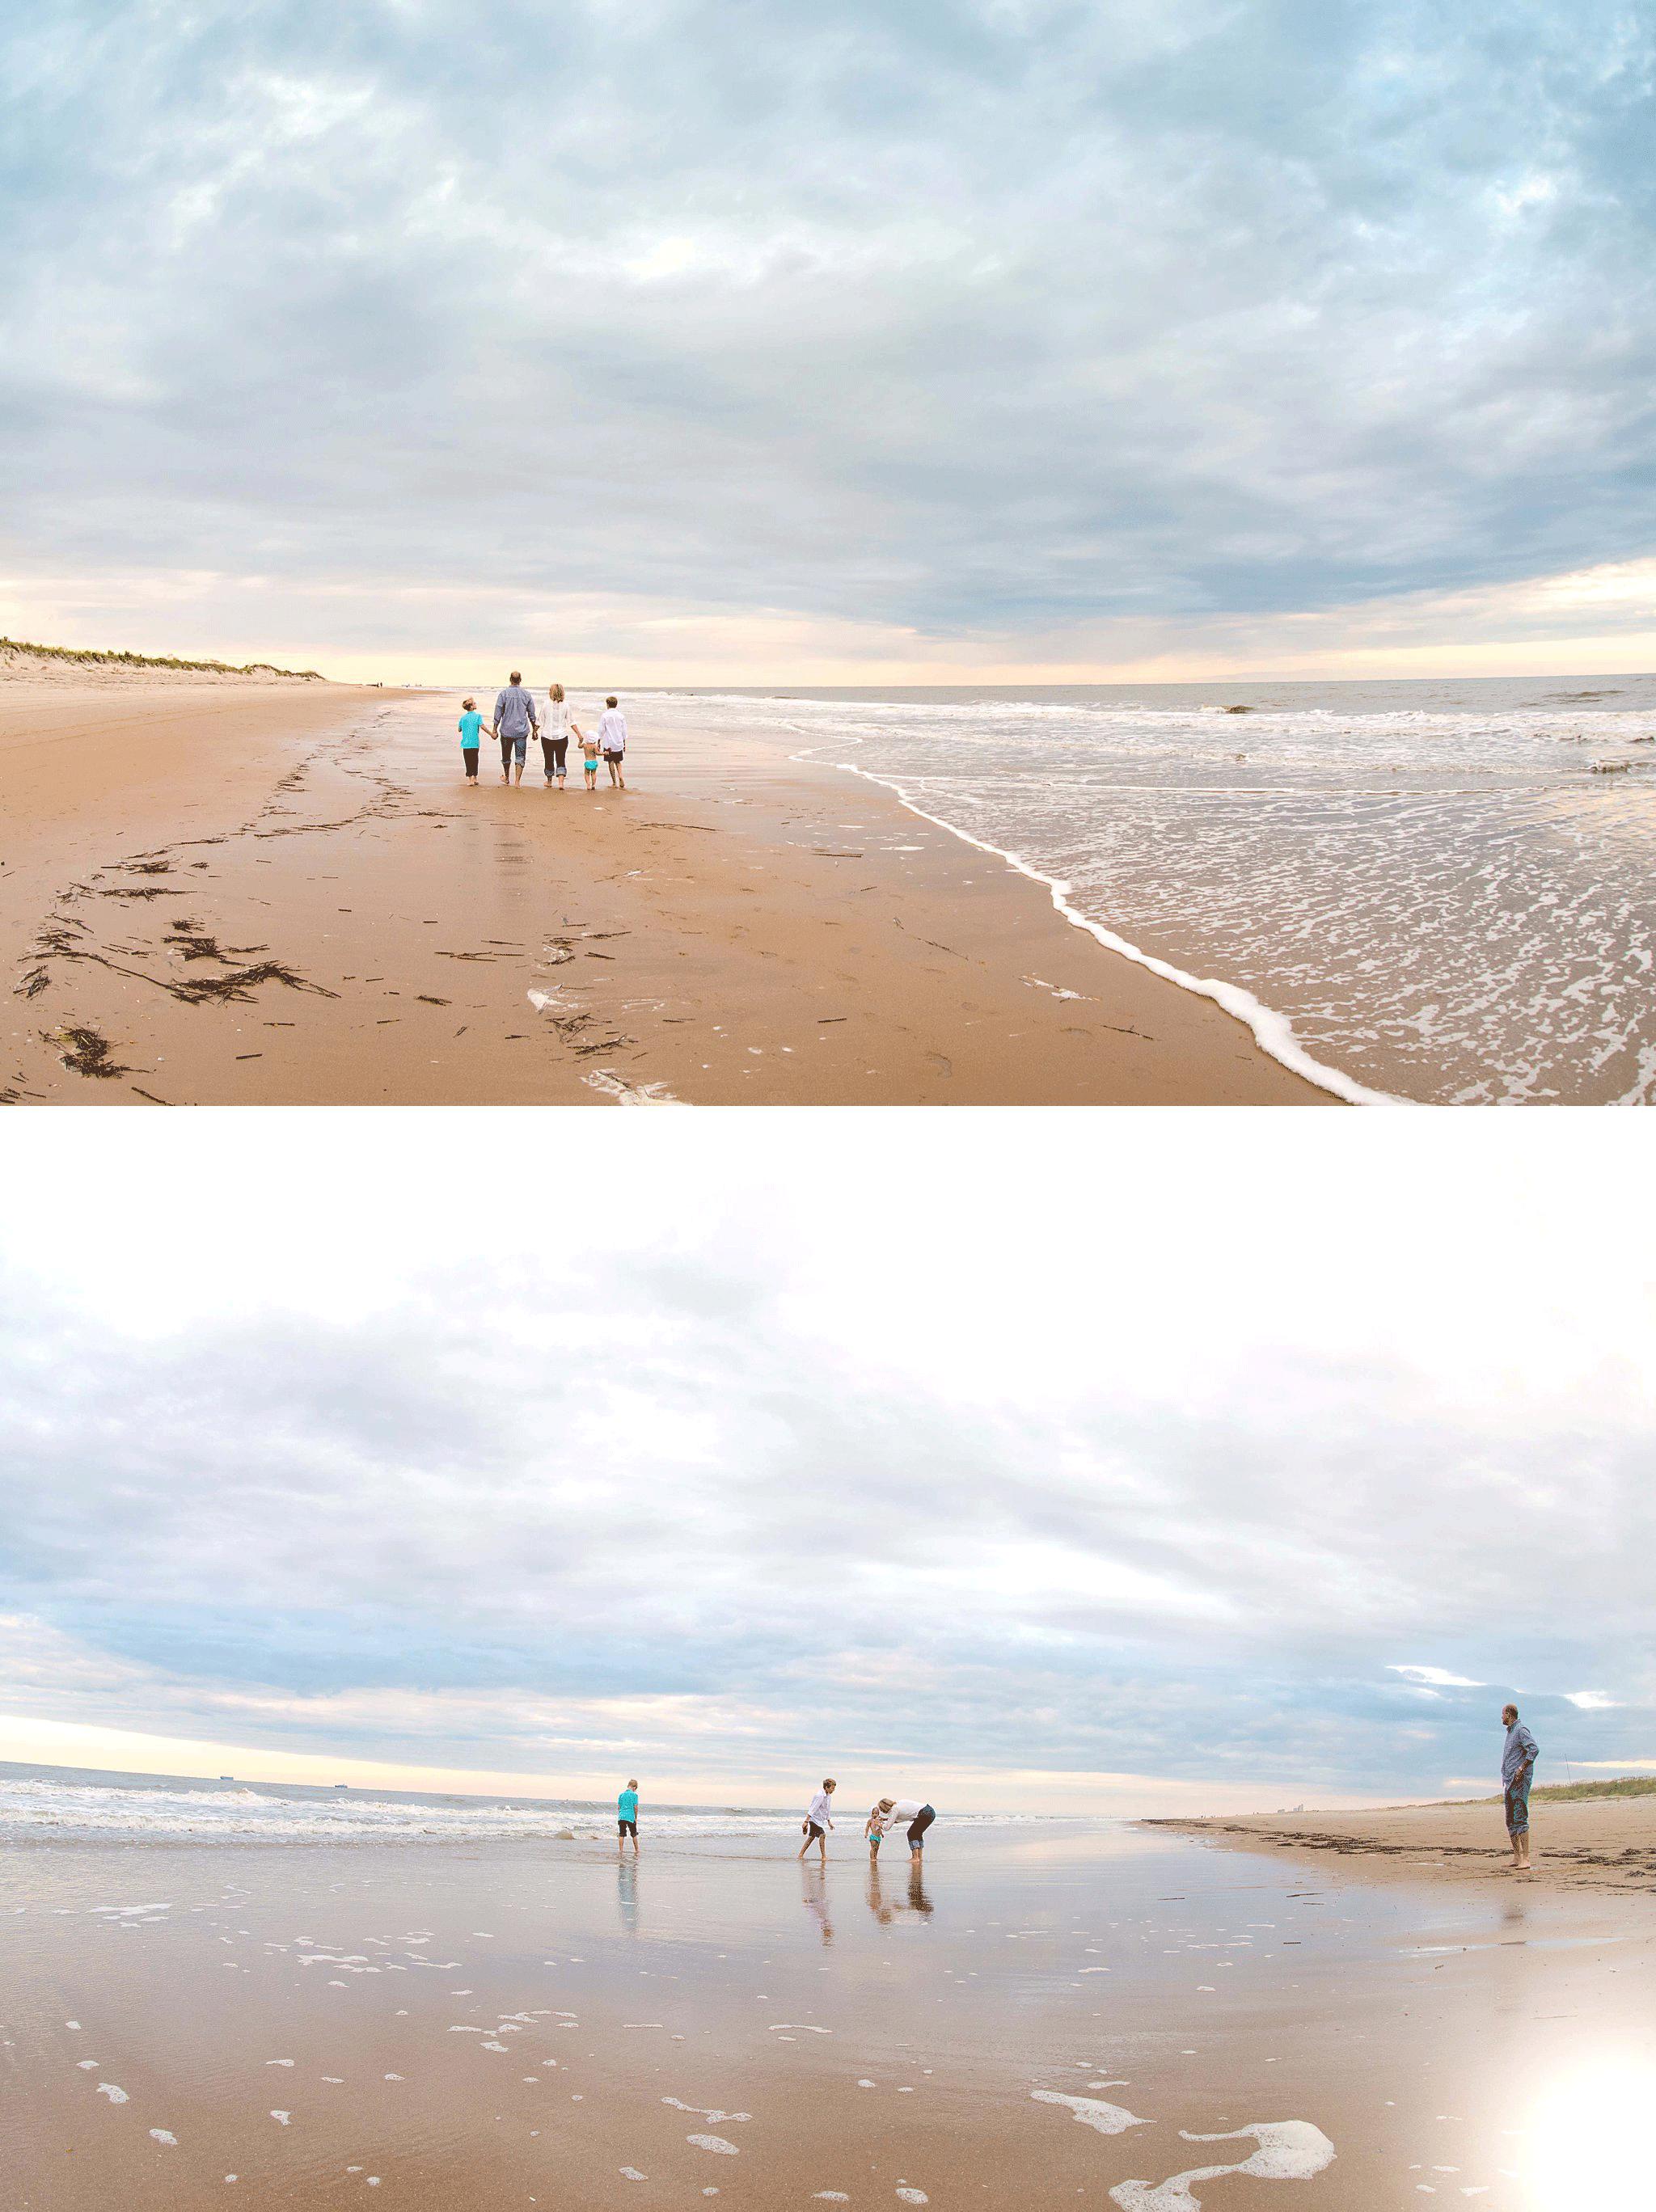 norfolk-portsmouth-chesapeake-suffolk-virginia-beach-photographers-melissa-bliss-photography-beach-photos.png